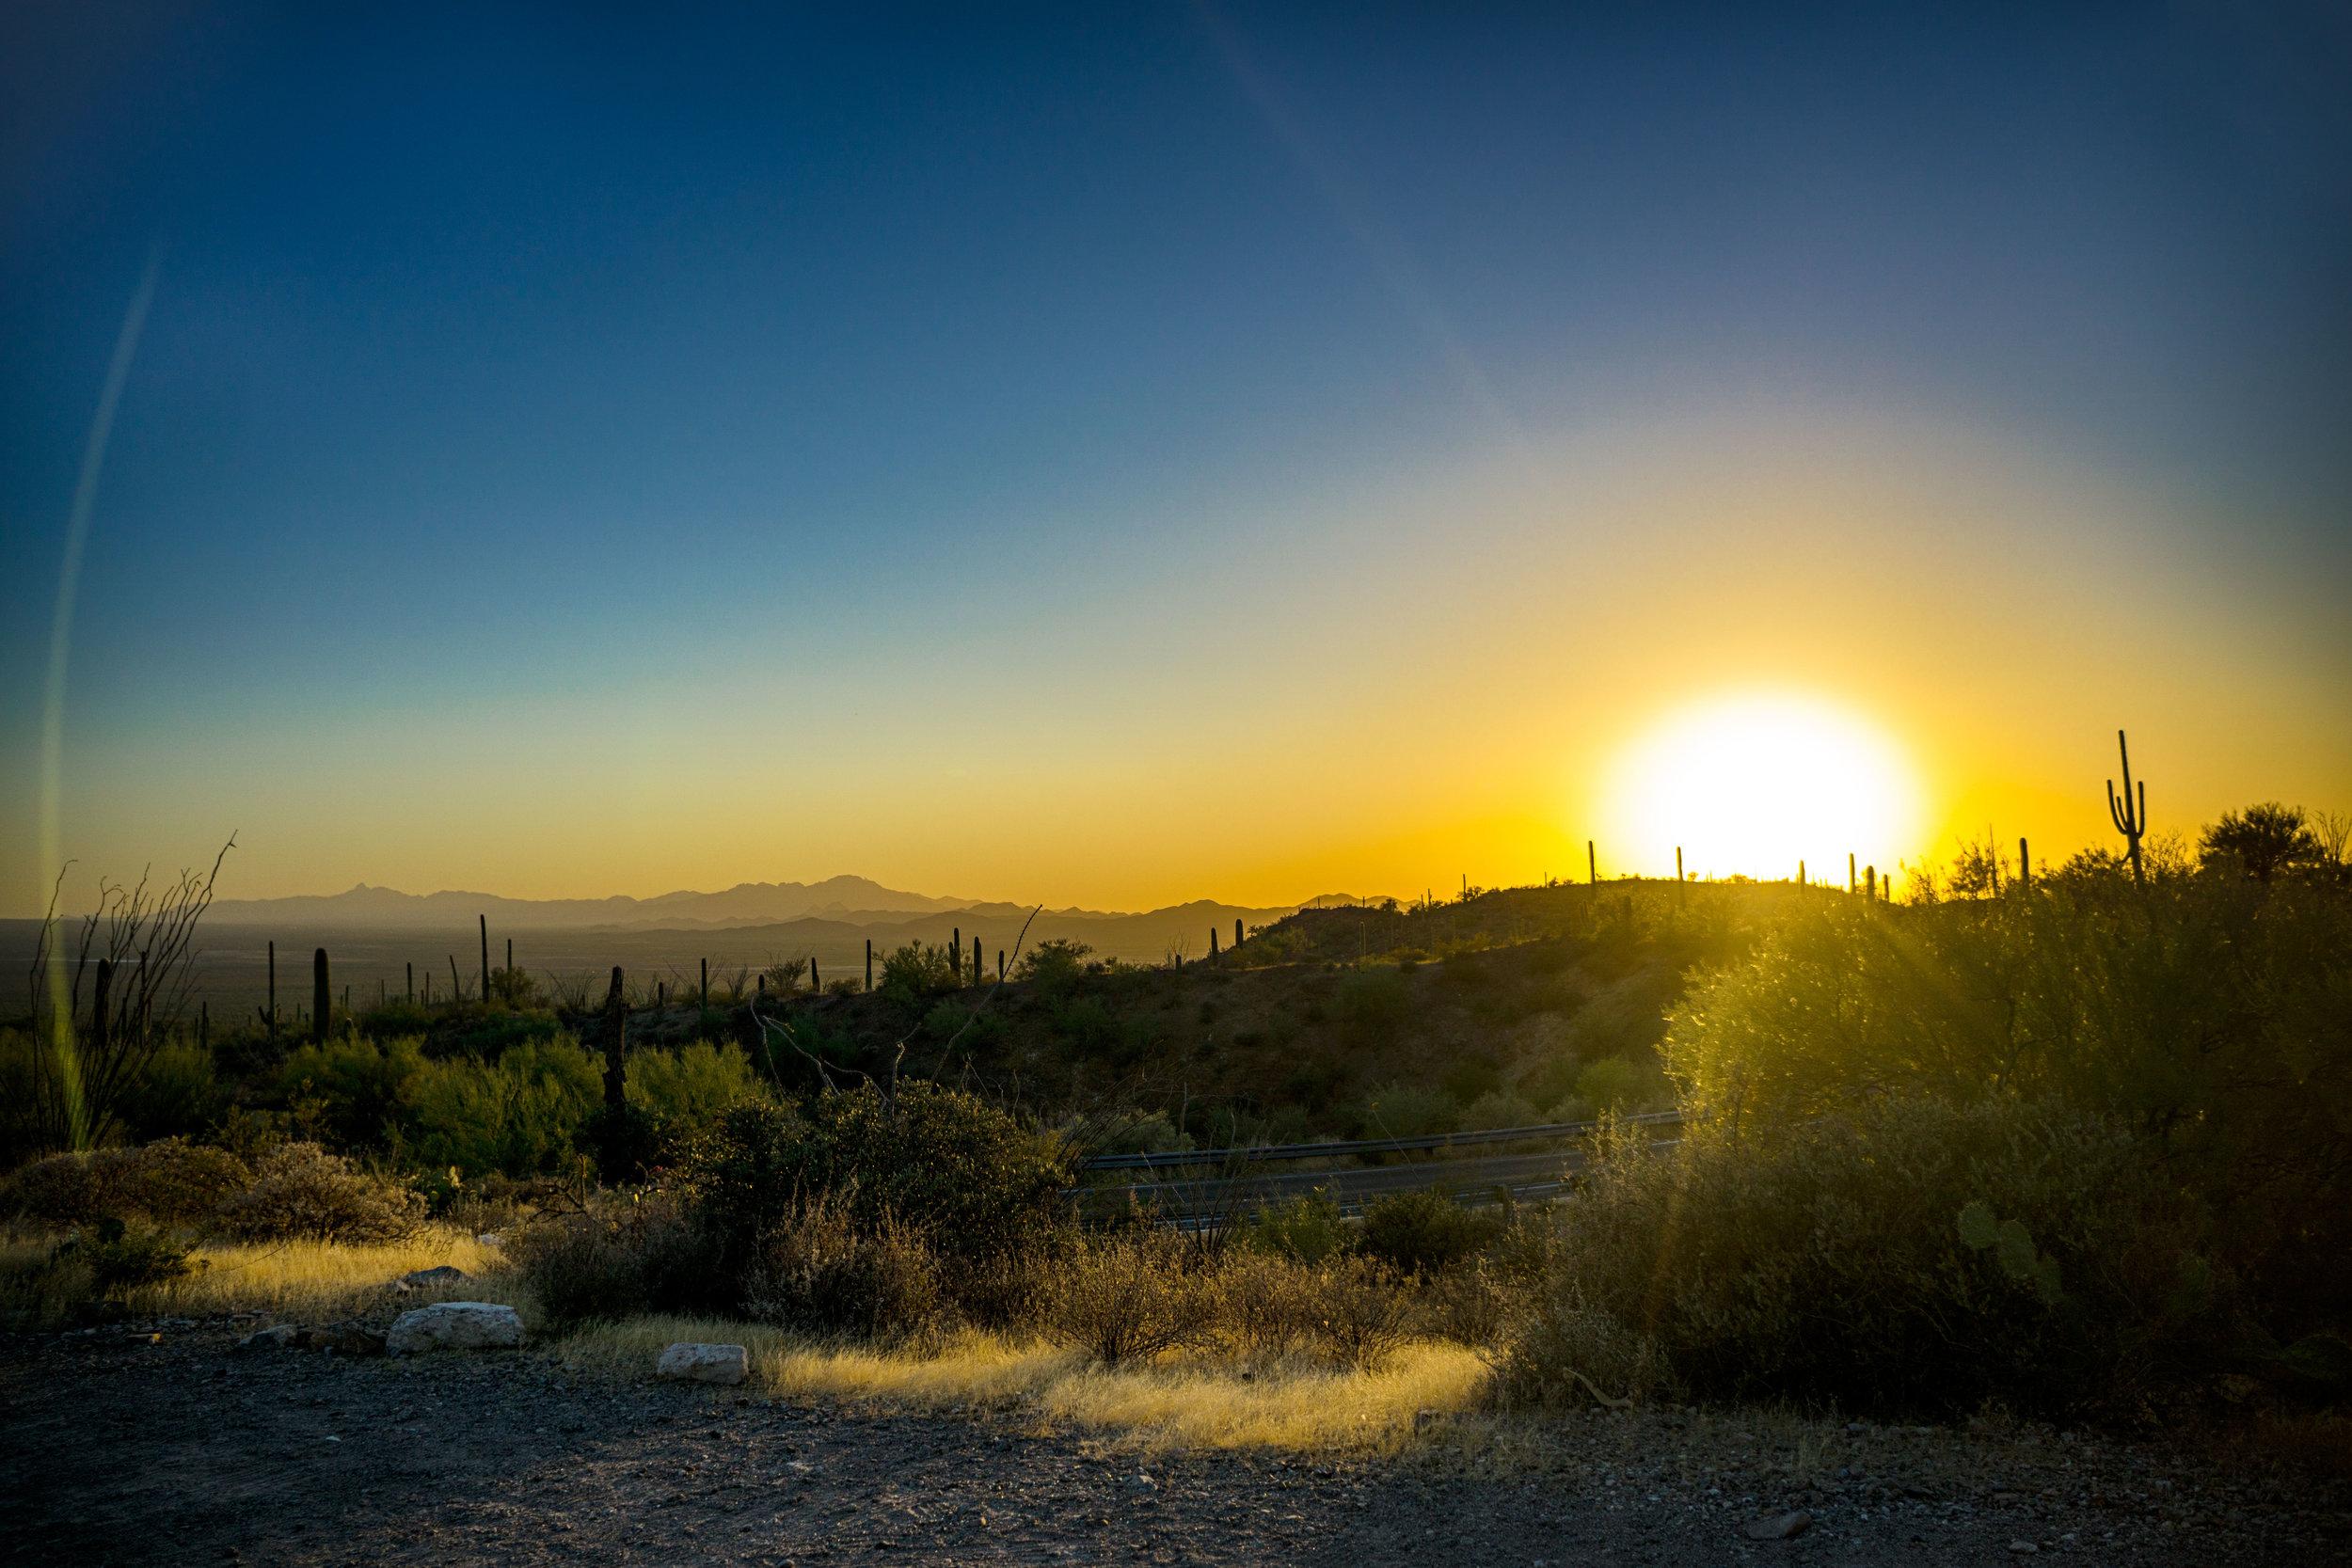 vickygood_photography_nature_saguaro-park.jpg